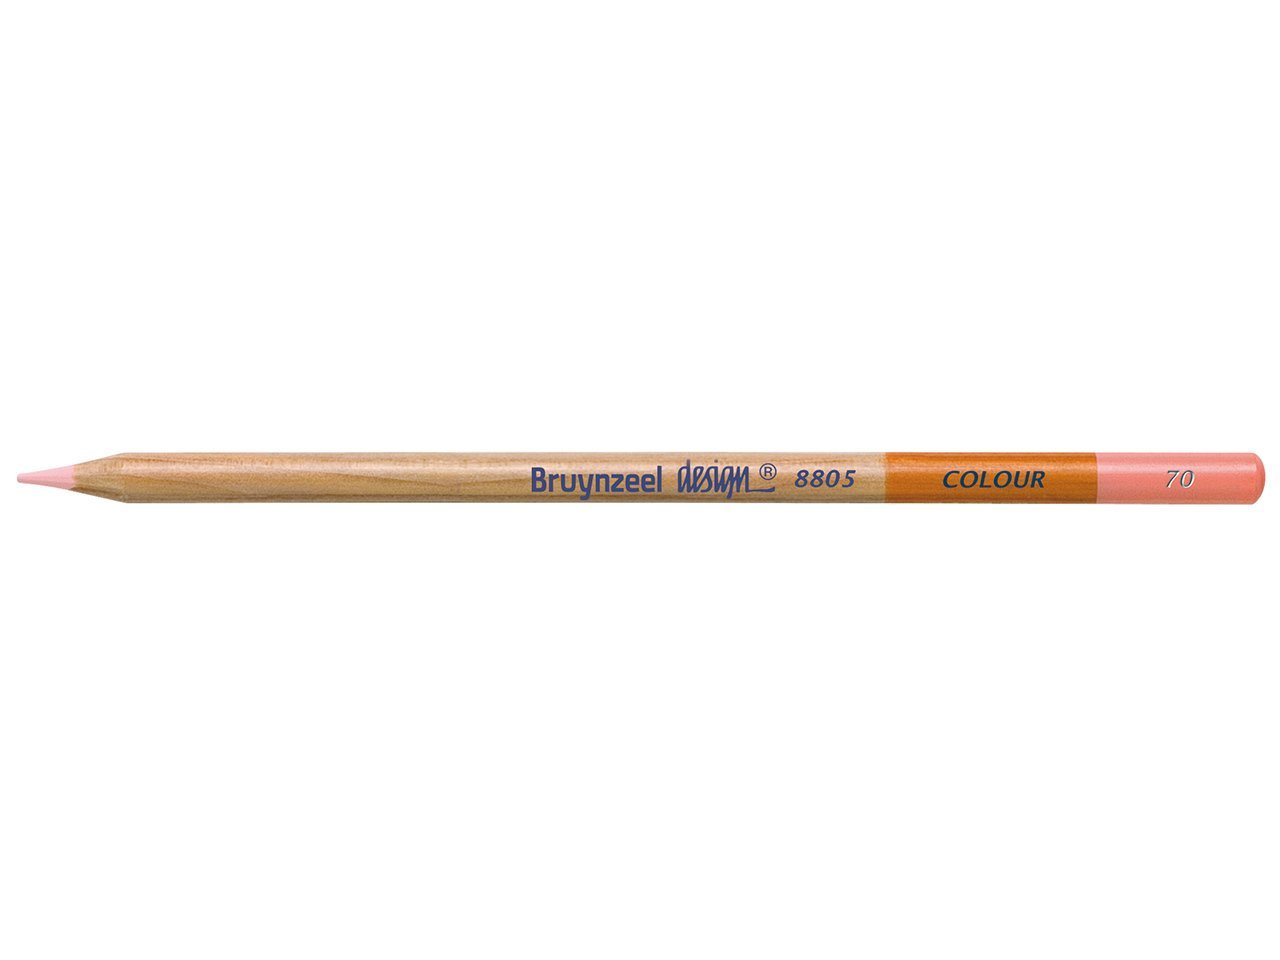 Bruynzeel Pencil - 70 Flesh Colour